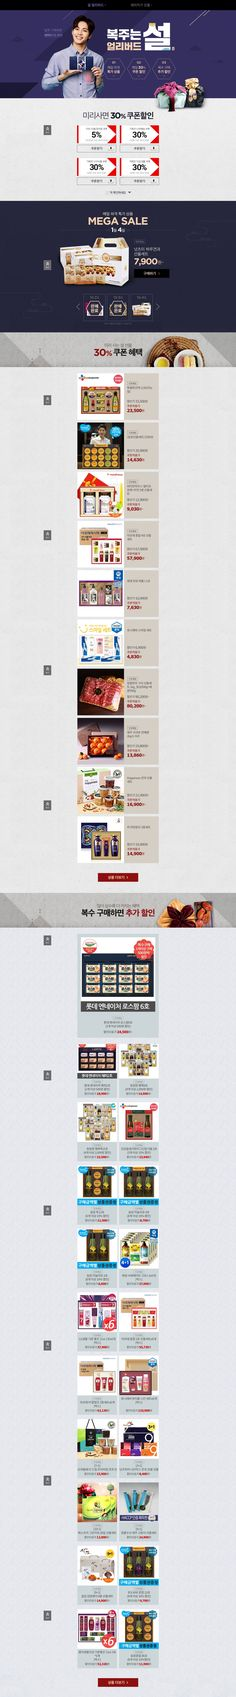 Event Banner, Web Banner, Web Design, Page Design, Promotional Design, Event Page, Web Layout, Psd Templates, Banner Design